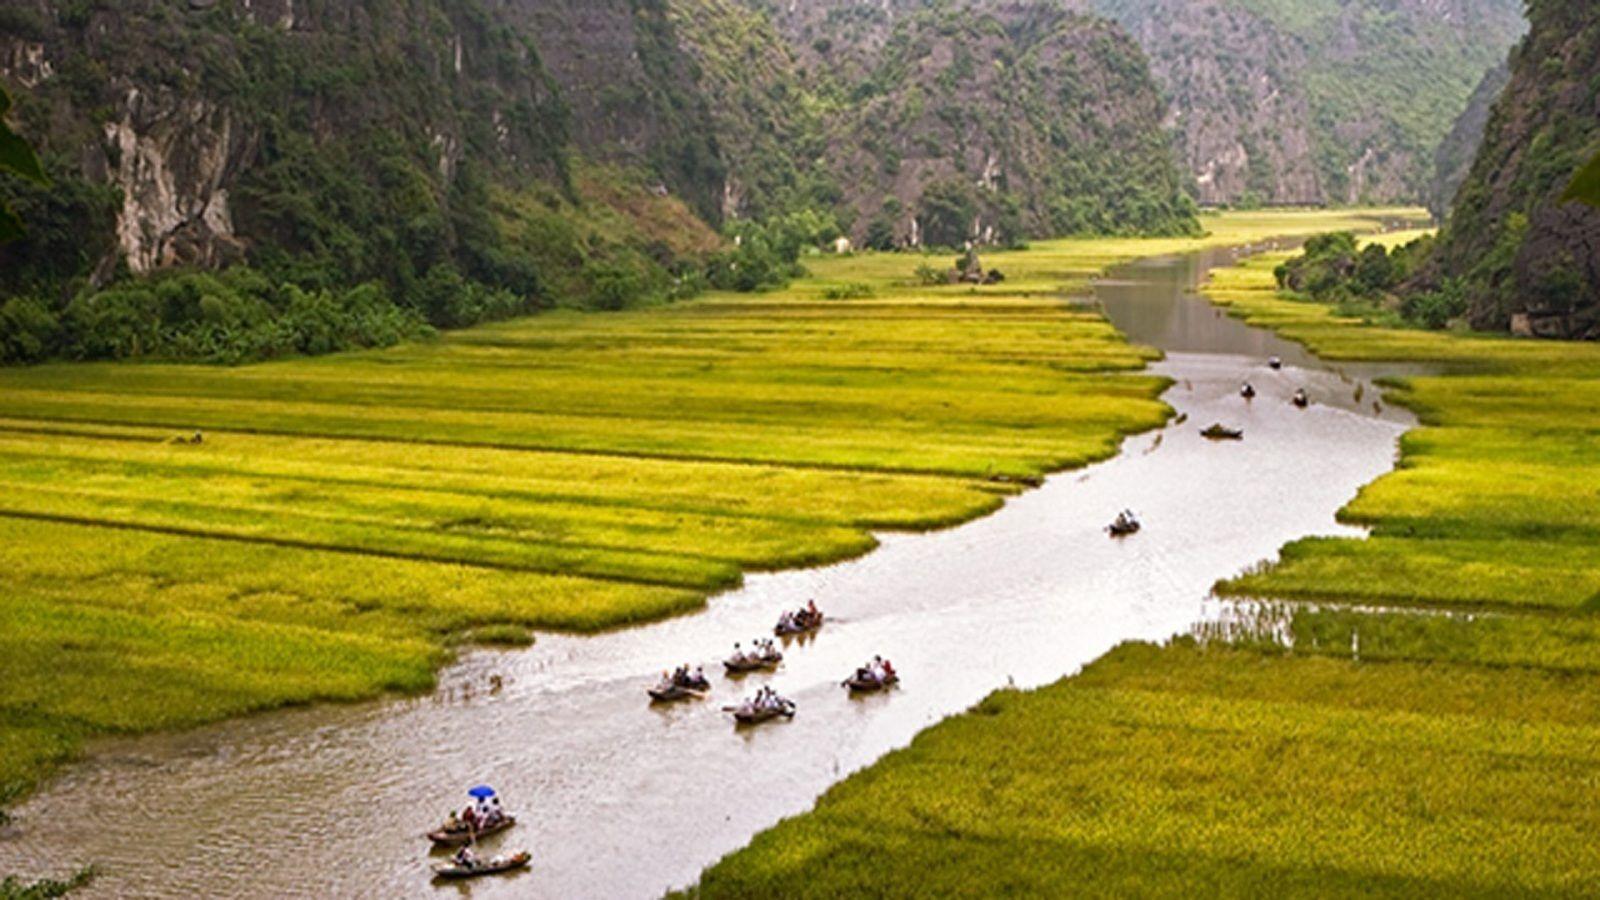 Visit Hoa Lu & Tam Coc in Ninh Binh full day tour from Hanoi